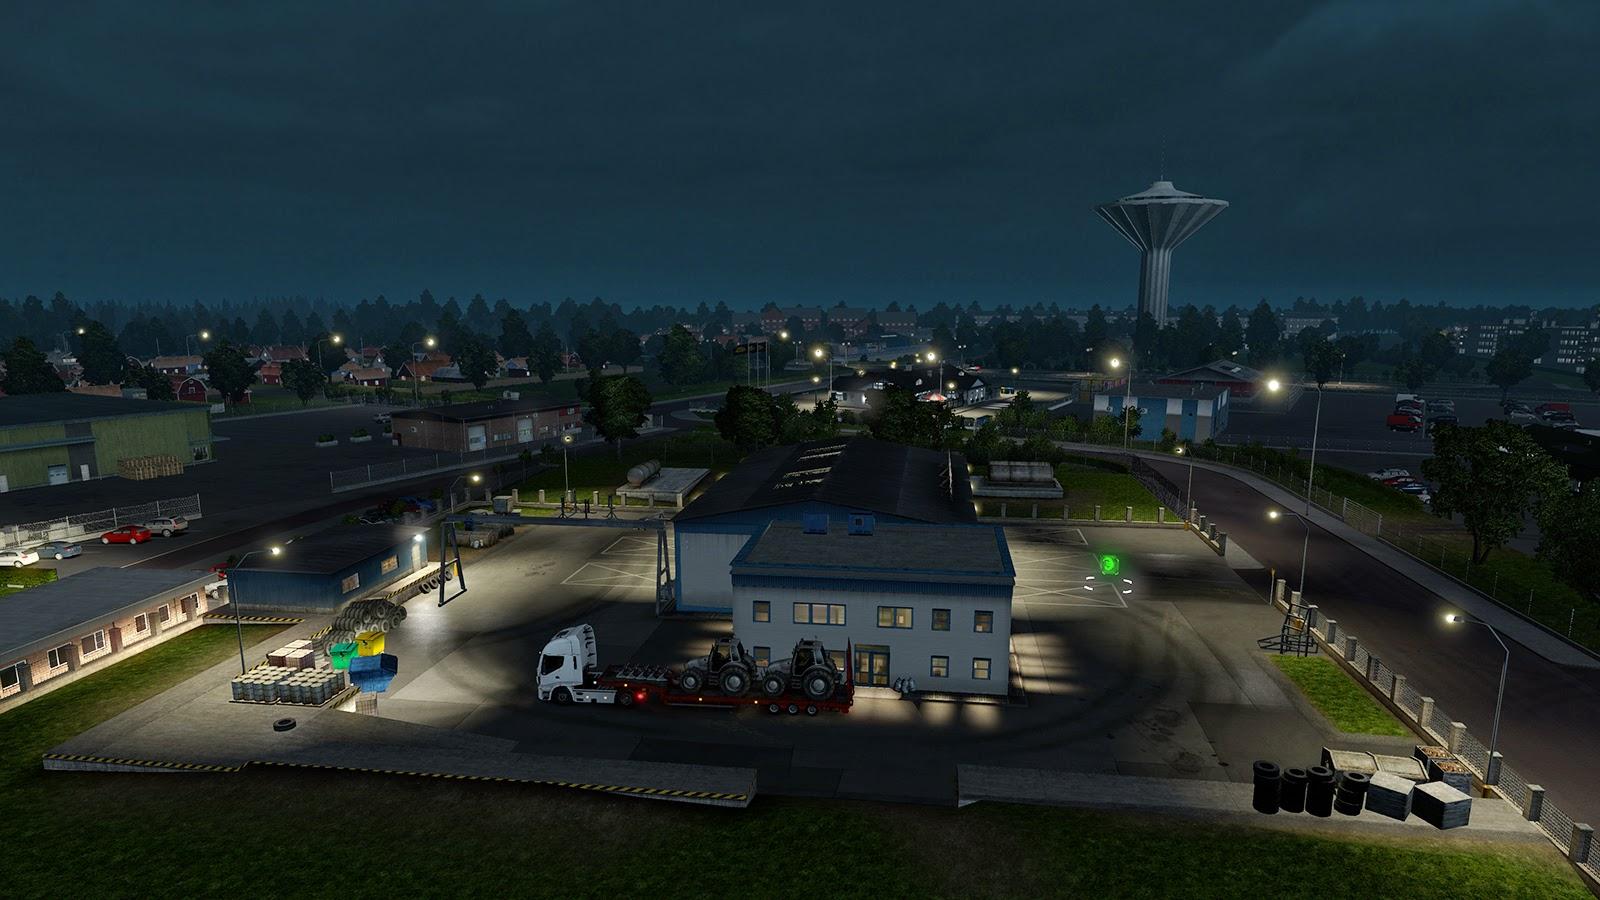 Obrazem: Městečko Örebro v Euro Truck Simulator 2 105677